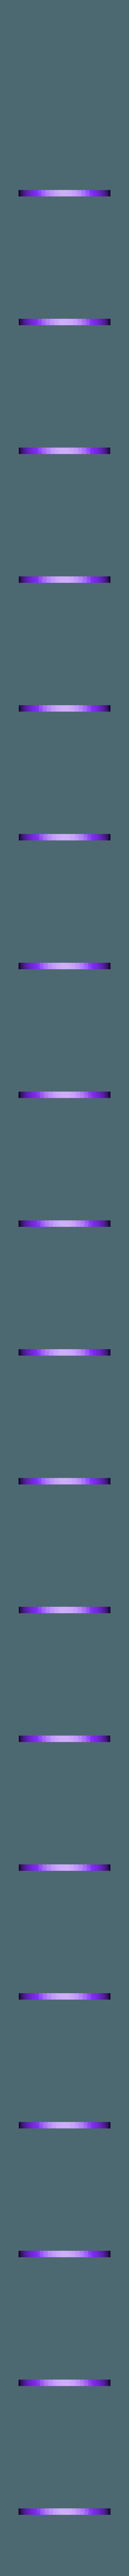 Orange_Lantern_Ring_pt2.STL Download free STL file Orange Lantern Ring for Dual Extrusion • 3D printing model, niceandeasy